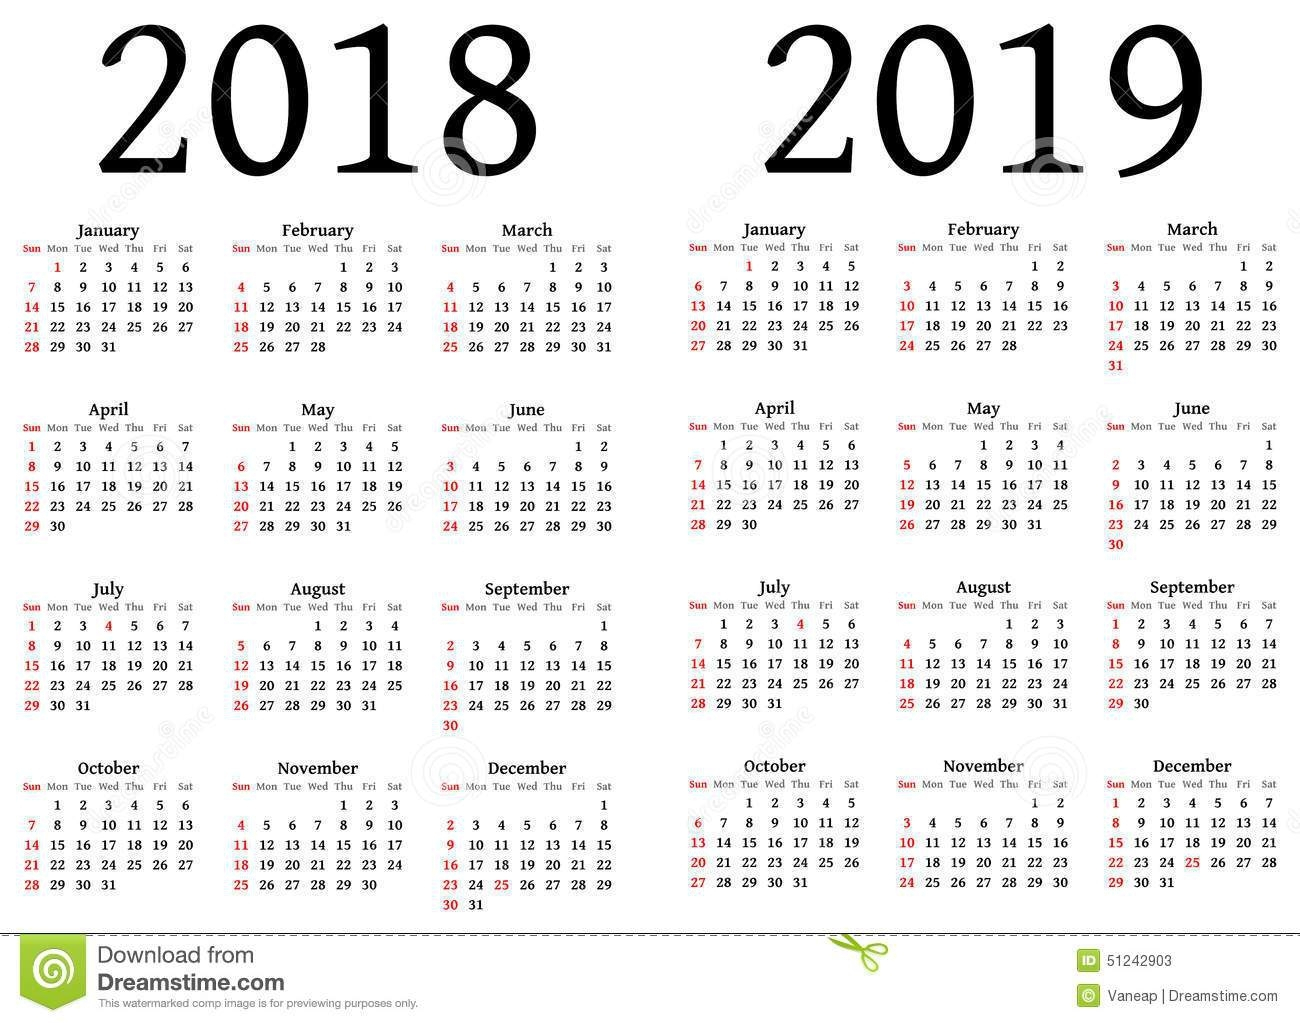 Julian Calendar – Printable Year Calendar regarding Julian Date Calendar 2018